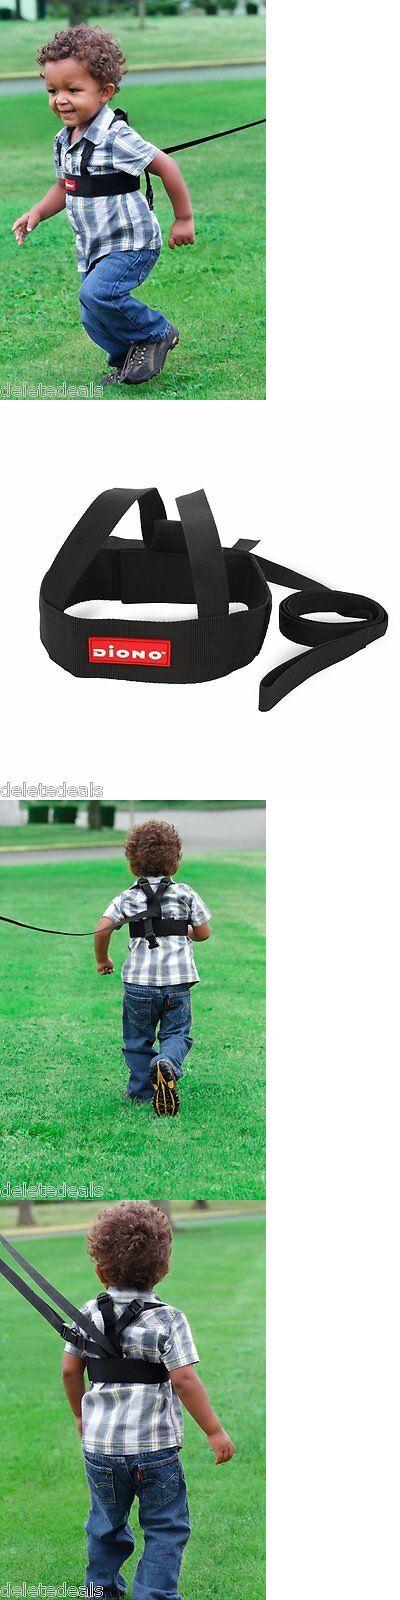 BABY TODDLER SAFETY LEASH KIDS WALKING HARNESS SURE STEPS CHILD BELT 1.2 m STAP